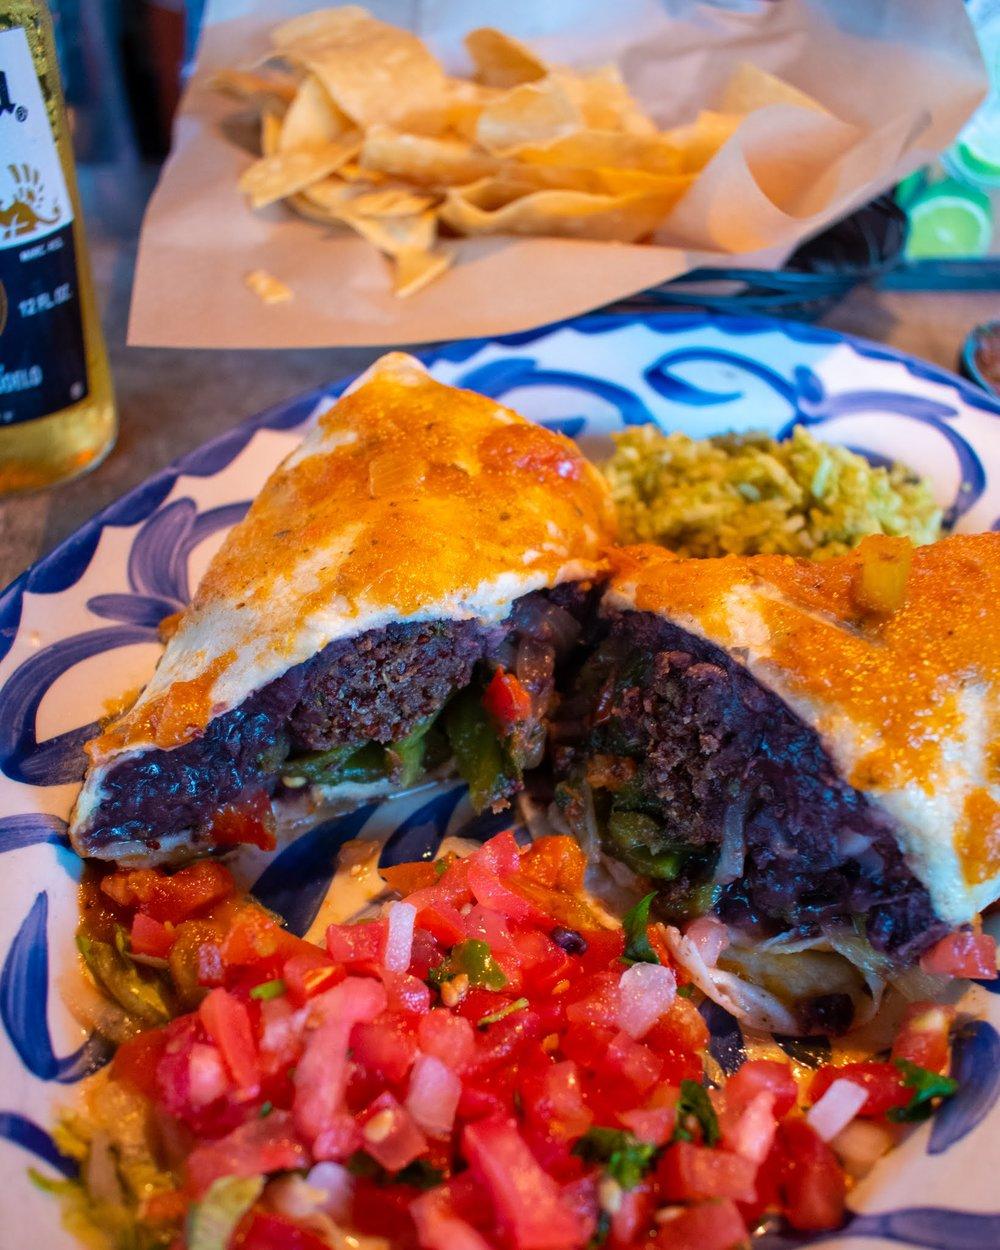 Uprooted-Traveler-Vegan-Disney-Land-downtown-disney-vegetarian-burrito-tortilla-jo's.jpg